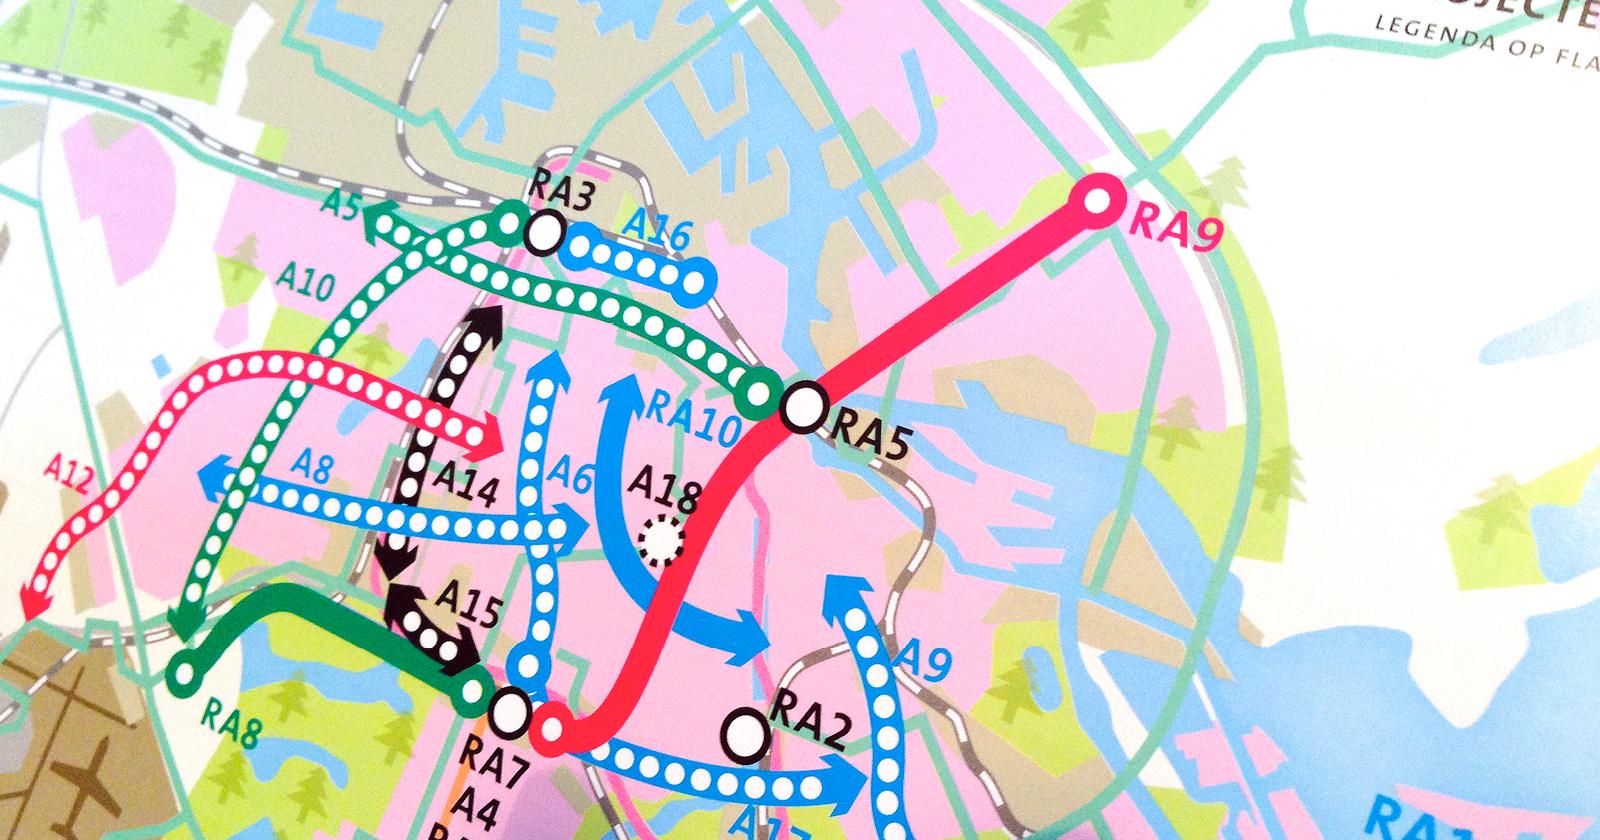 info-cartografics9-StadsregioAmsterdam